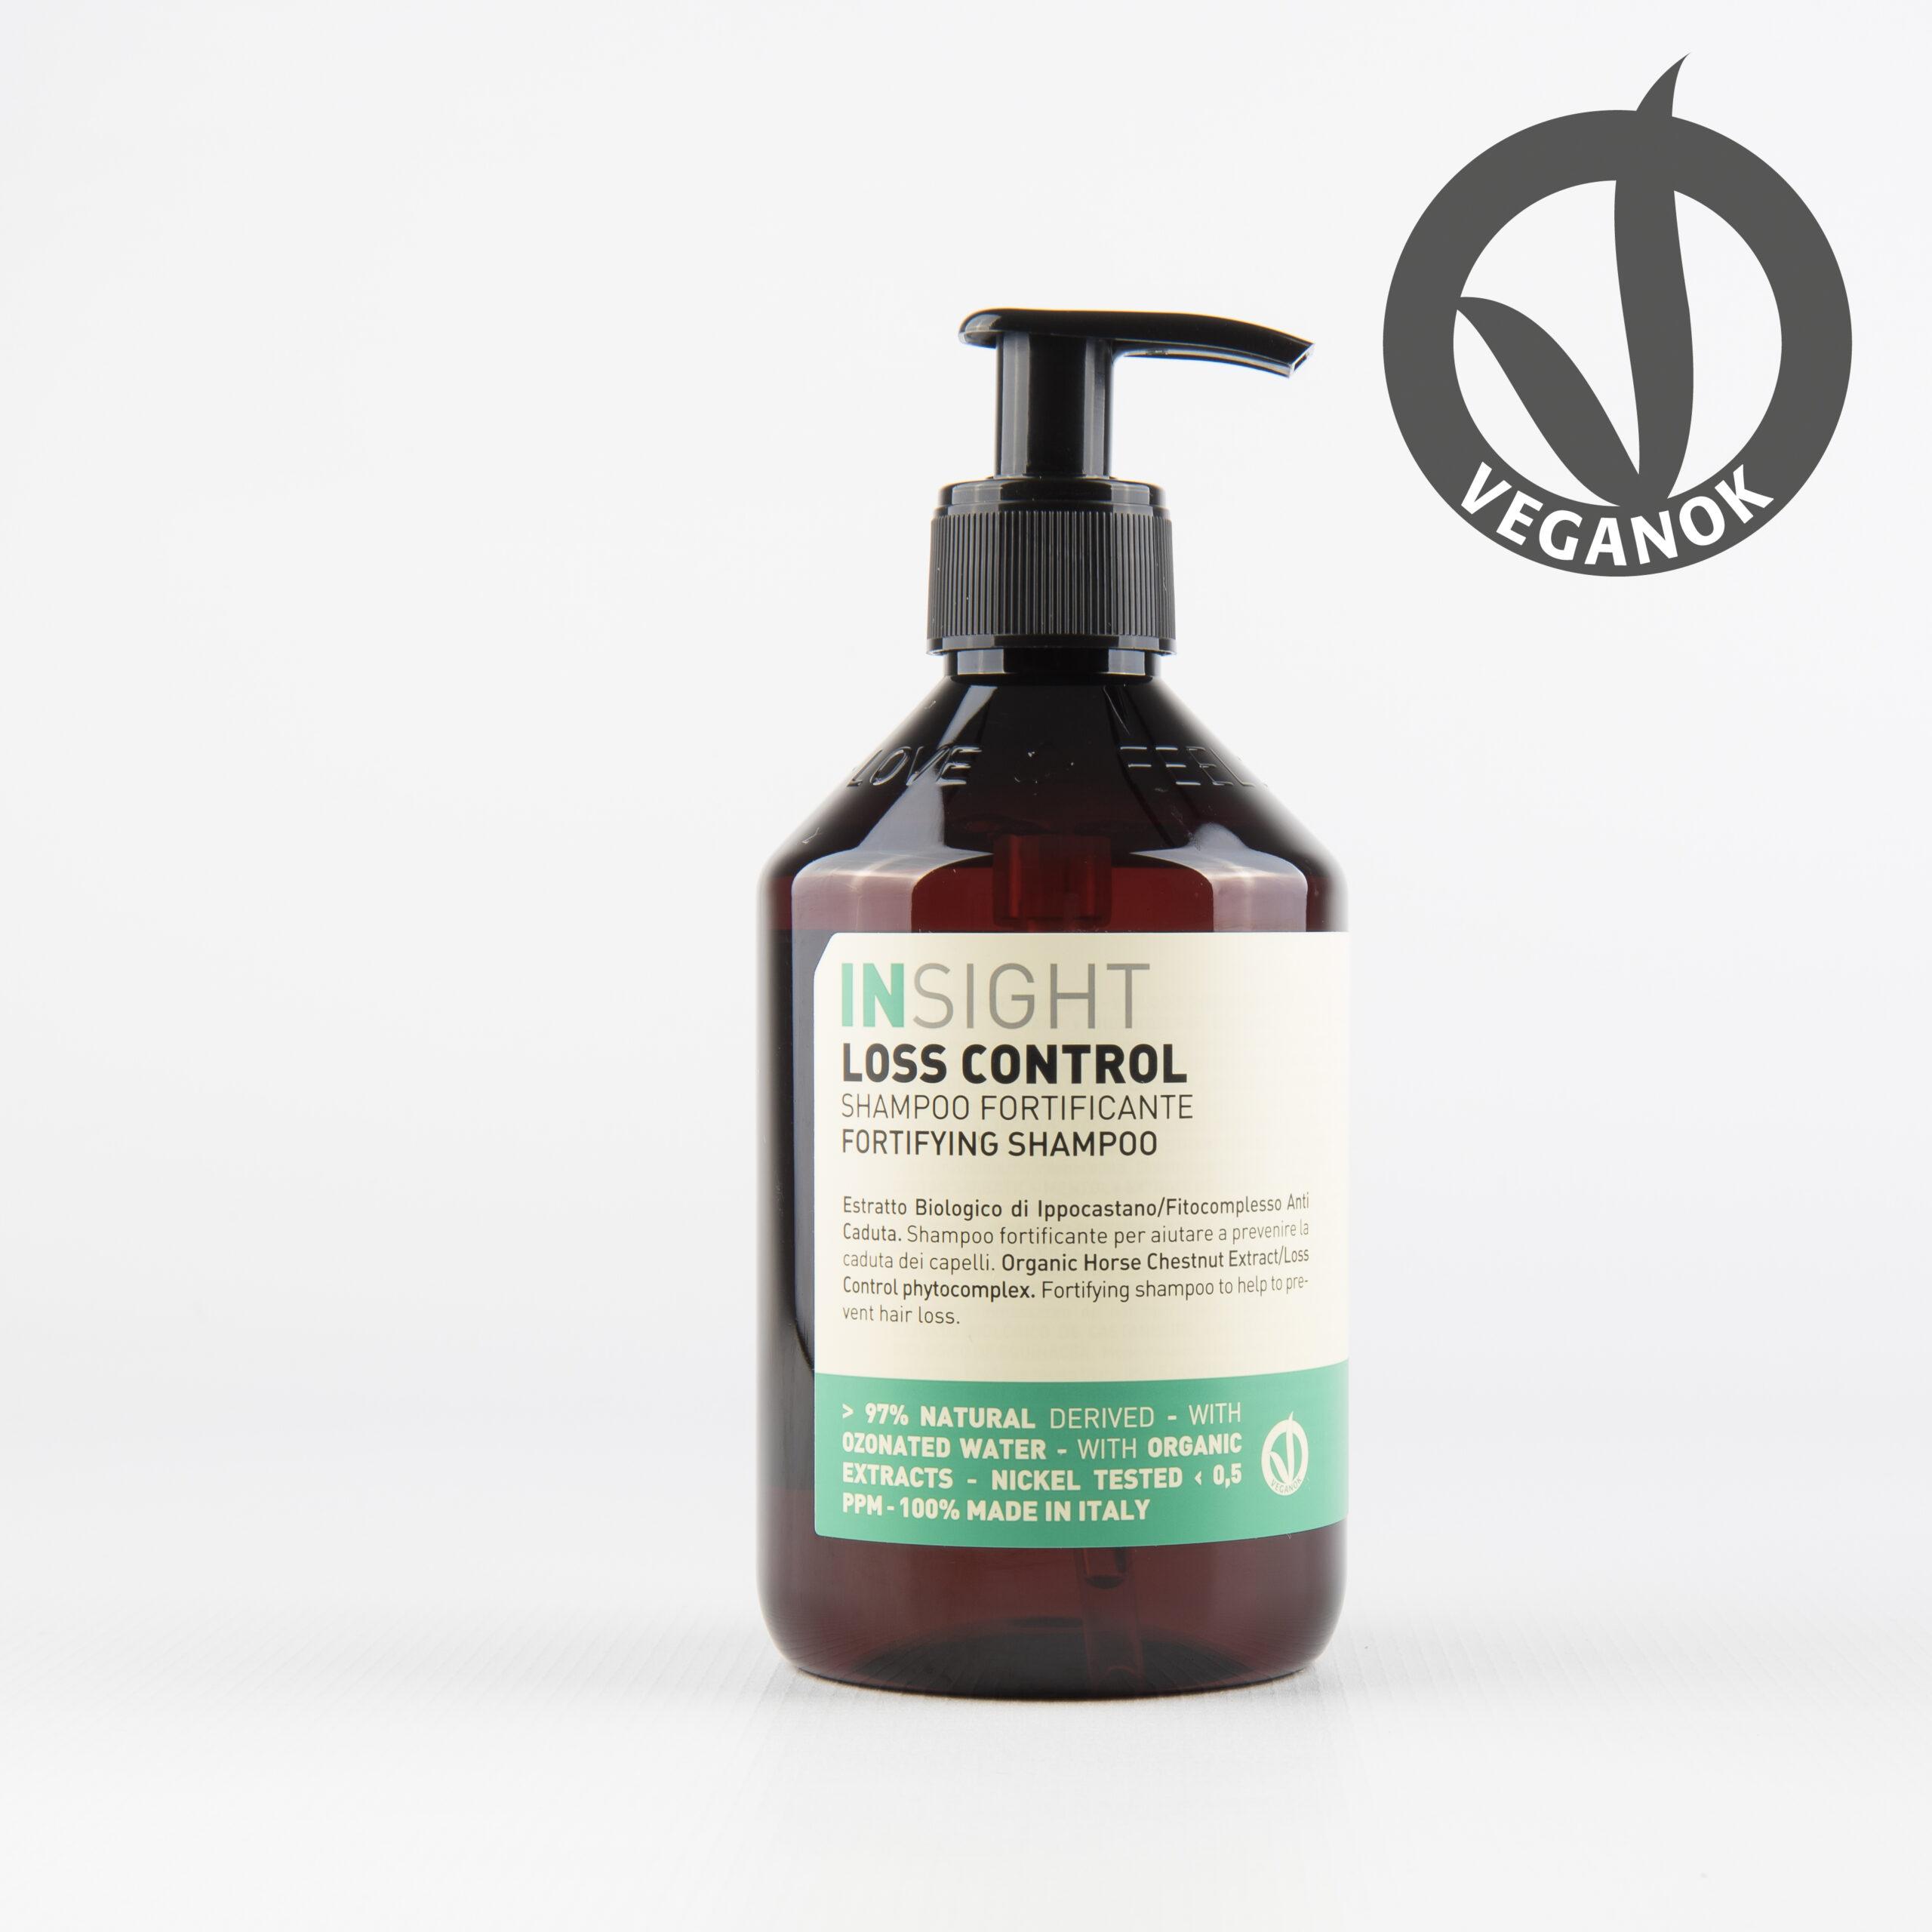 Loss Control Shampoo